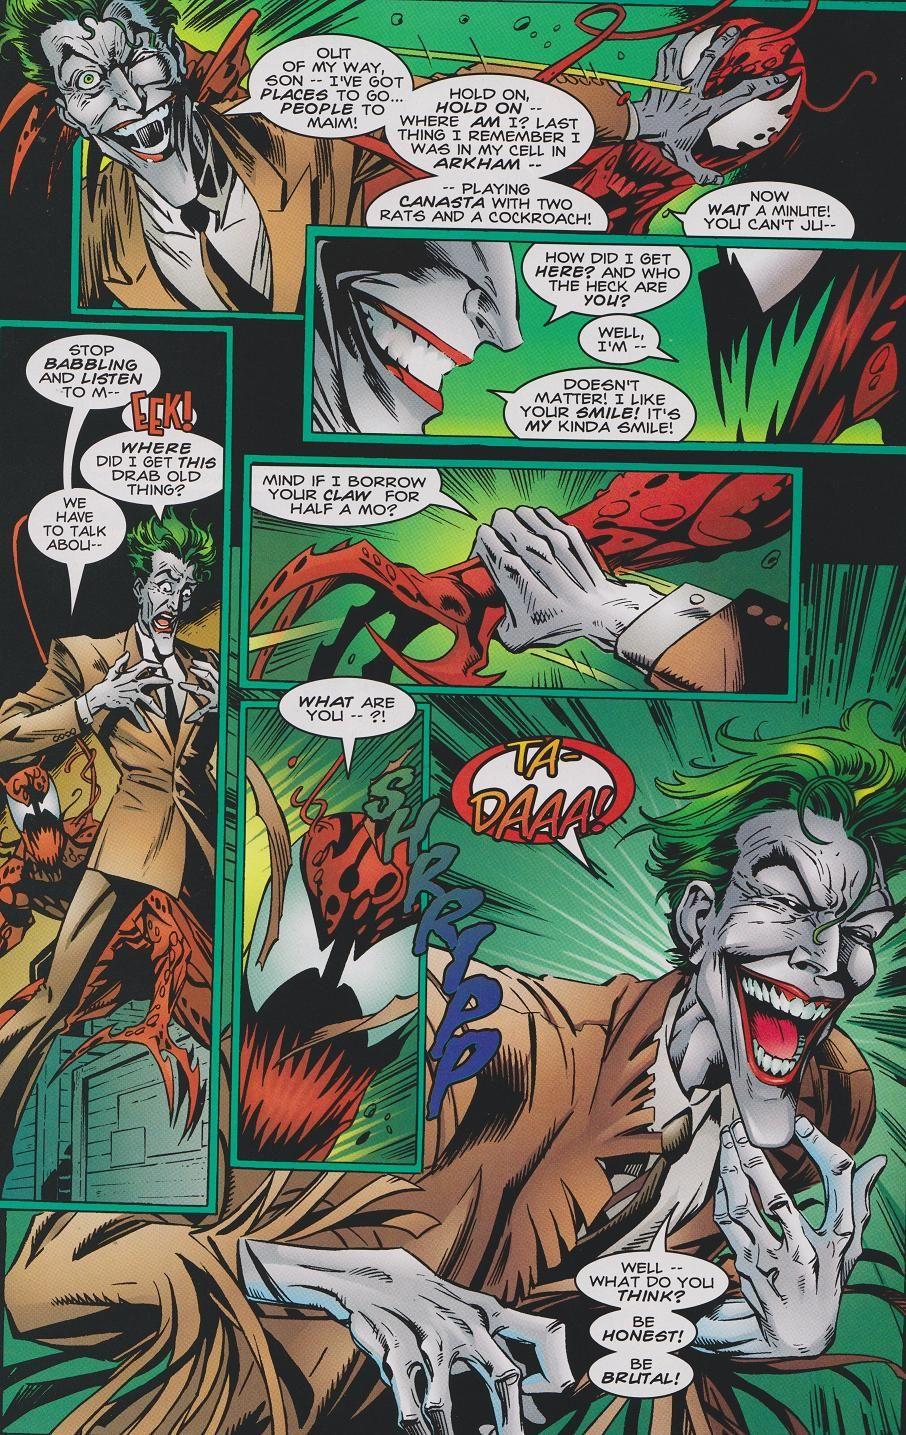 Carnage vs. Joker - KillerMovies.com